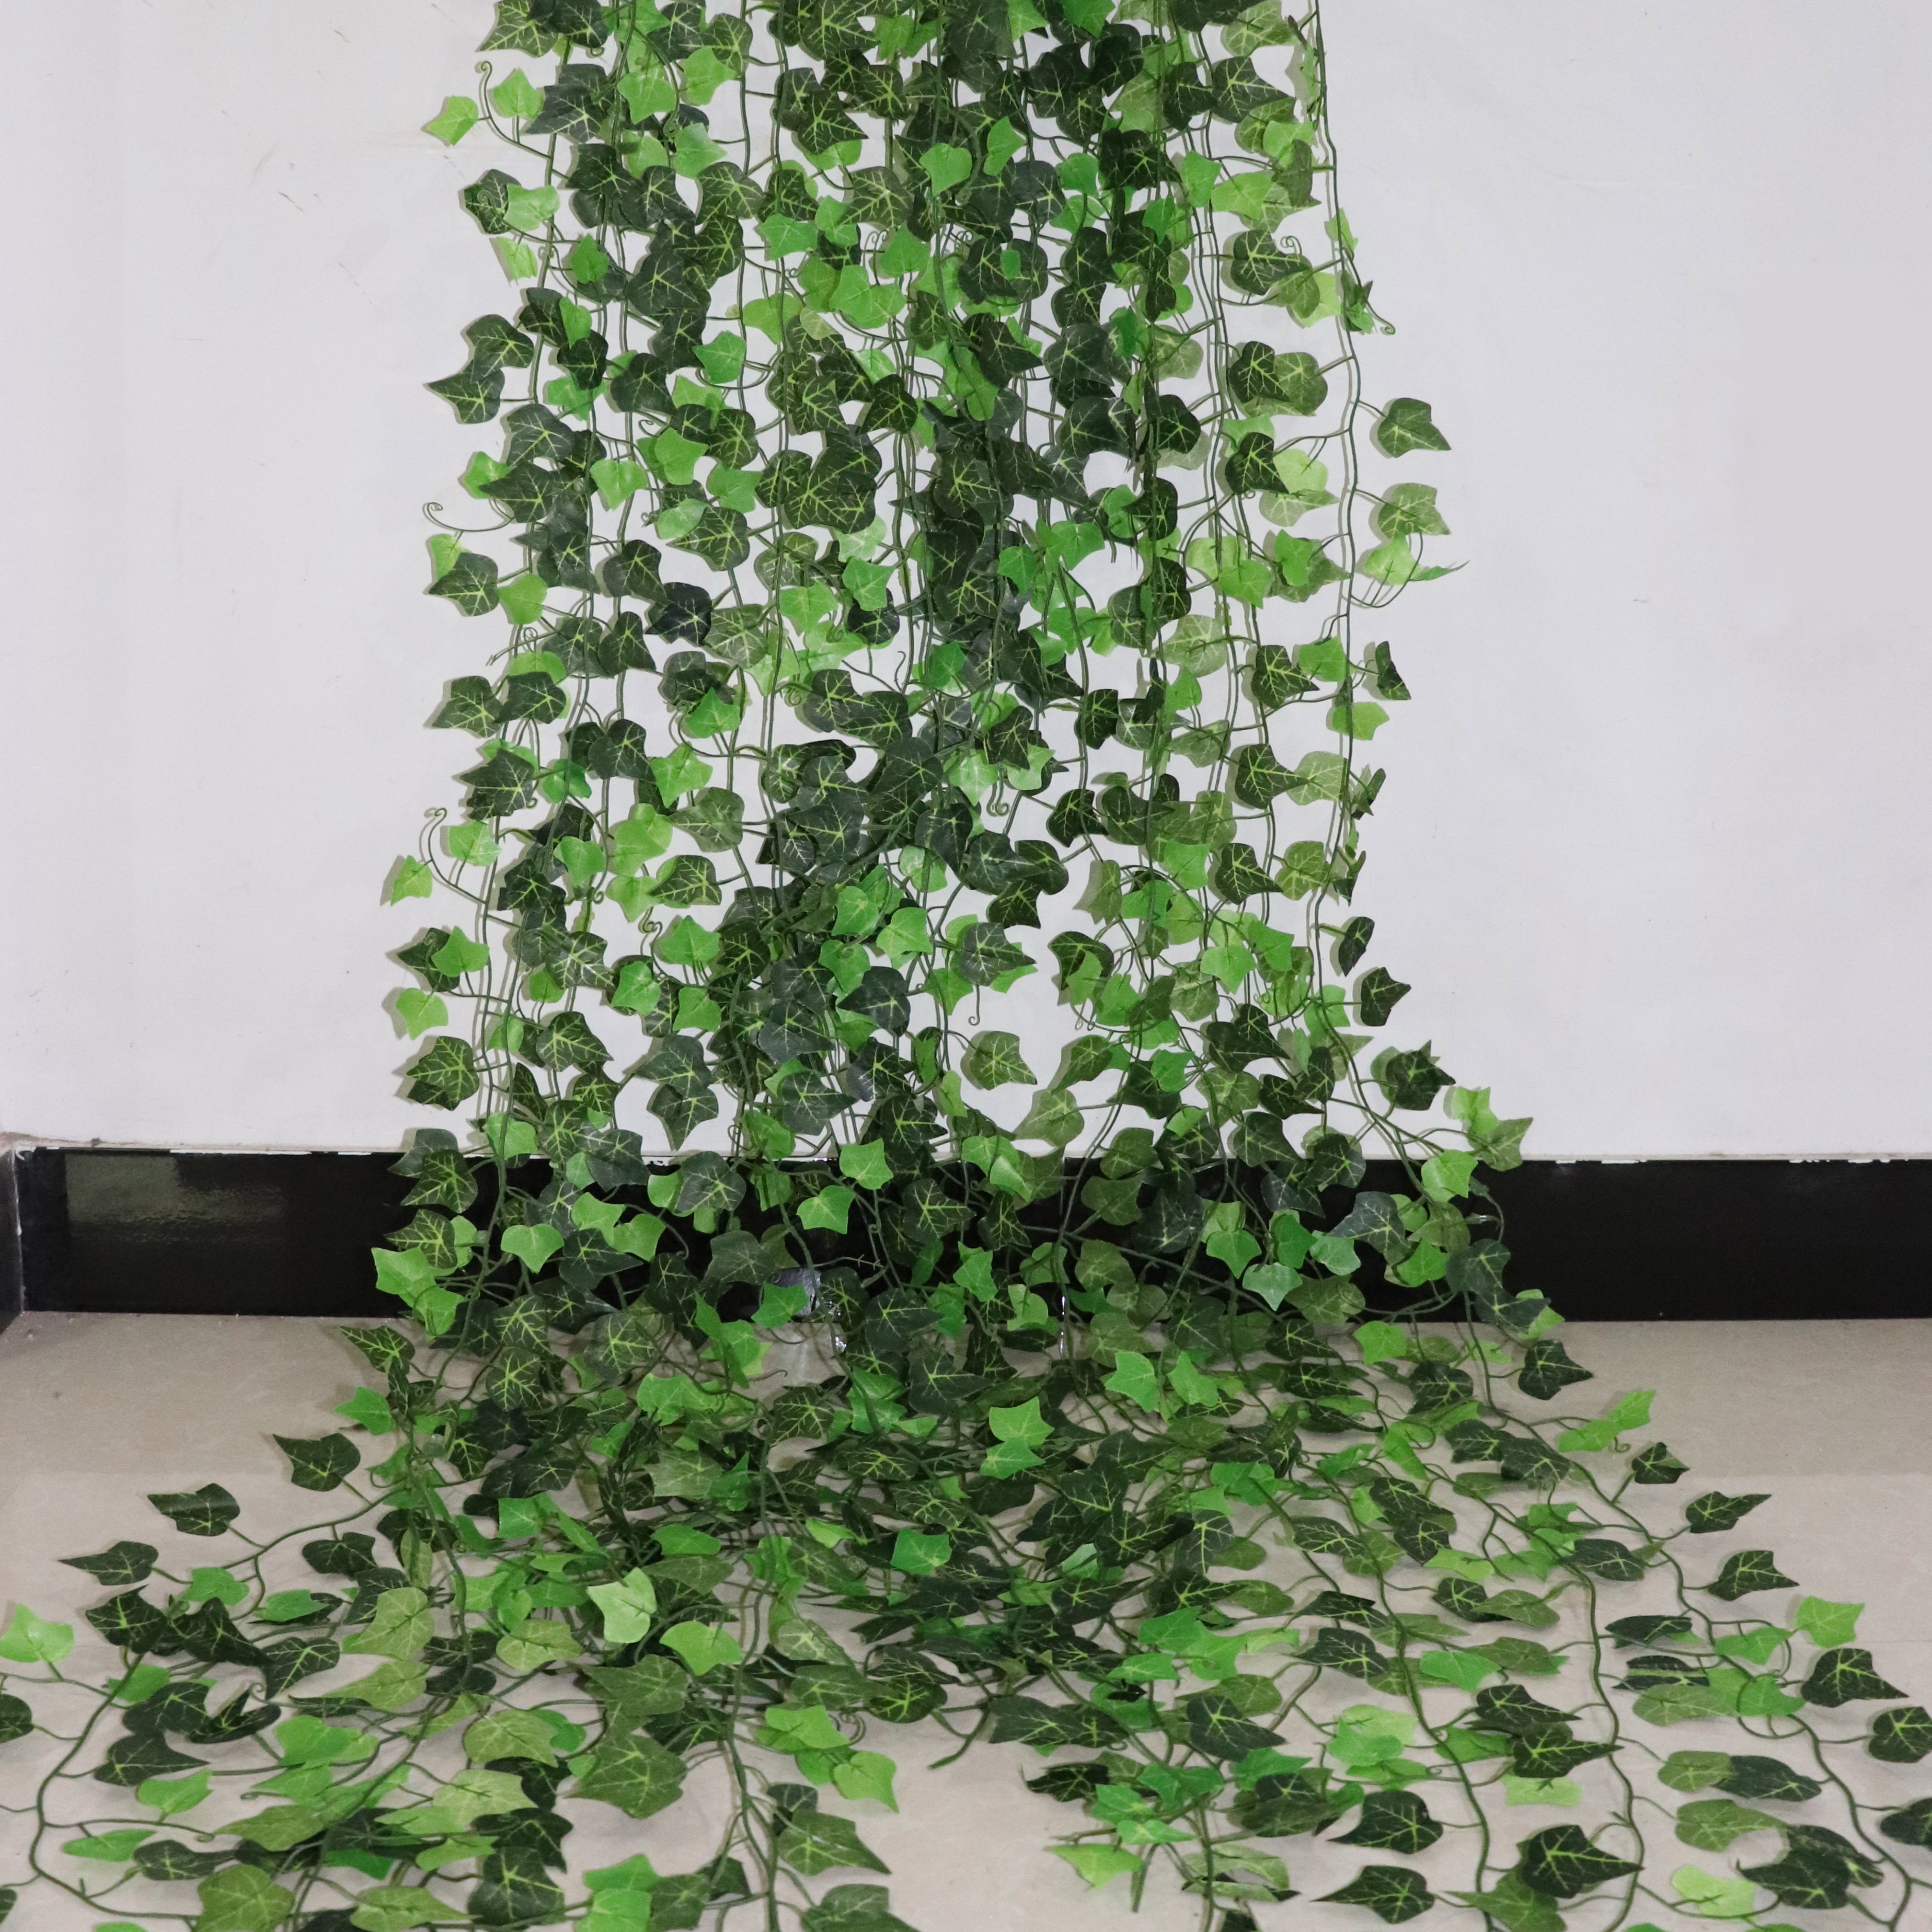 100pcs Leaf 1 piece 2.4M Home Decor Artificial Ivy Leaf Garland Plants Vine Fake Foliage Flowers Creeper Green Ivy Wreath(China)